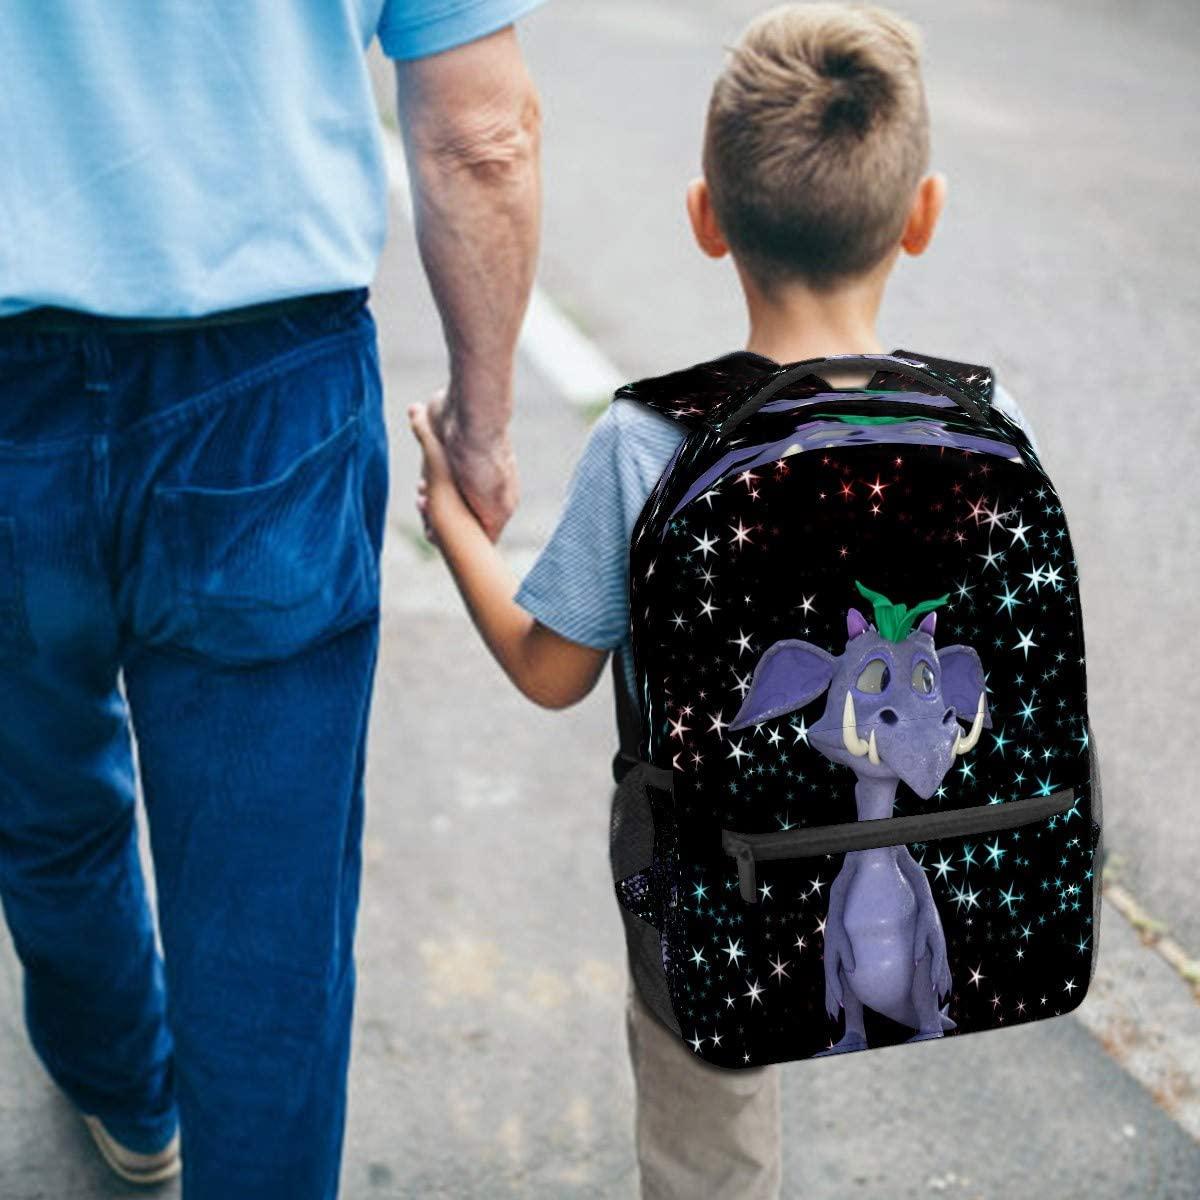 Dragon Cartoon Character Backpack for Kids Girls Boys Teen Elementary School Children Bookbag Camping Daypack Purse Laptop Bag Tote multfunction Pocket with Wide Shoulder Straps